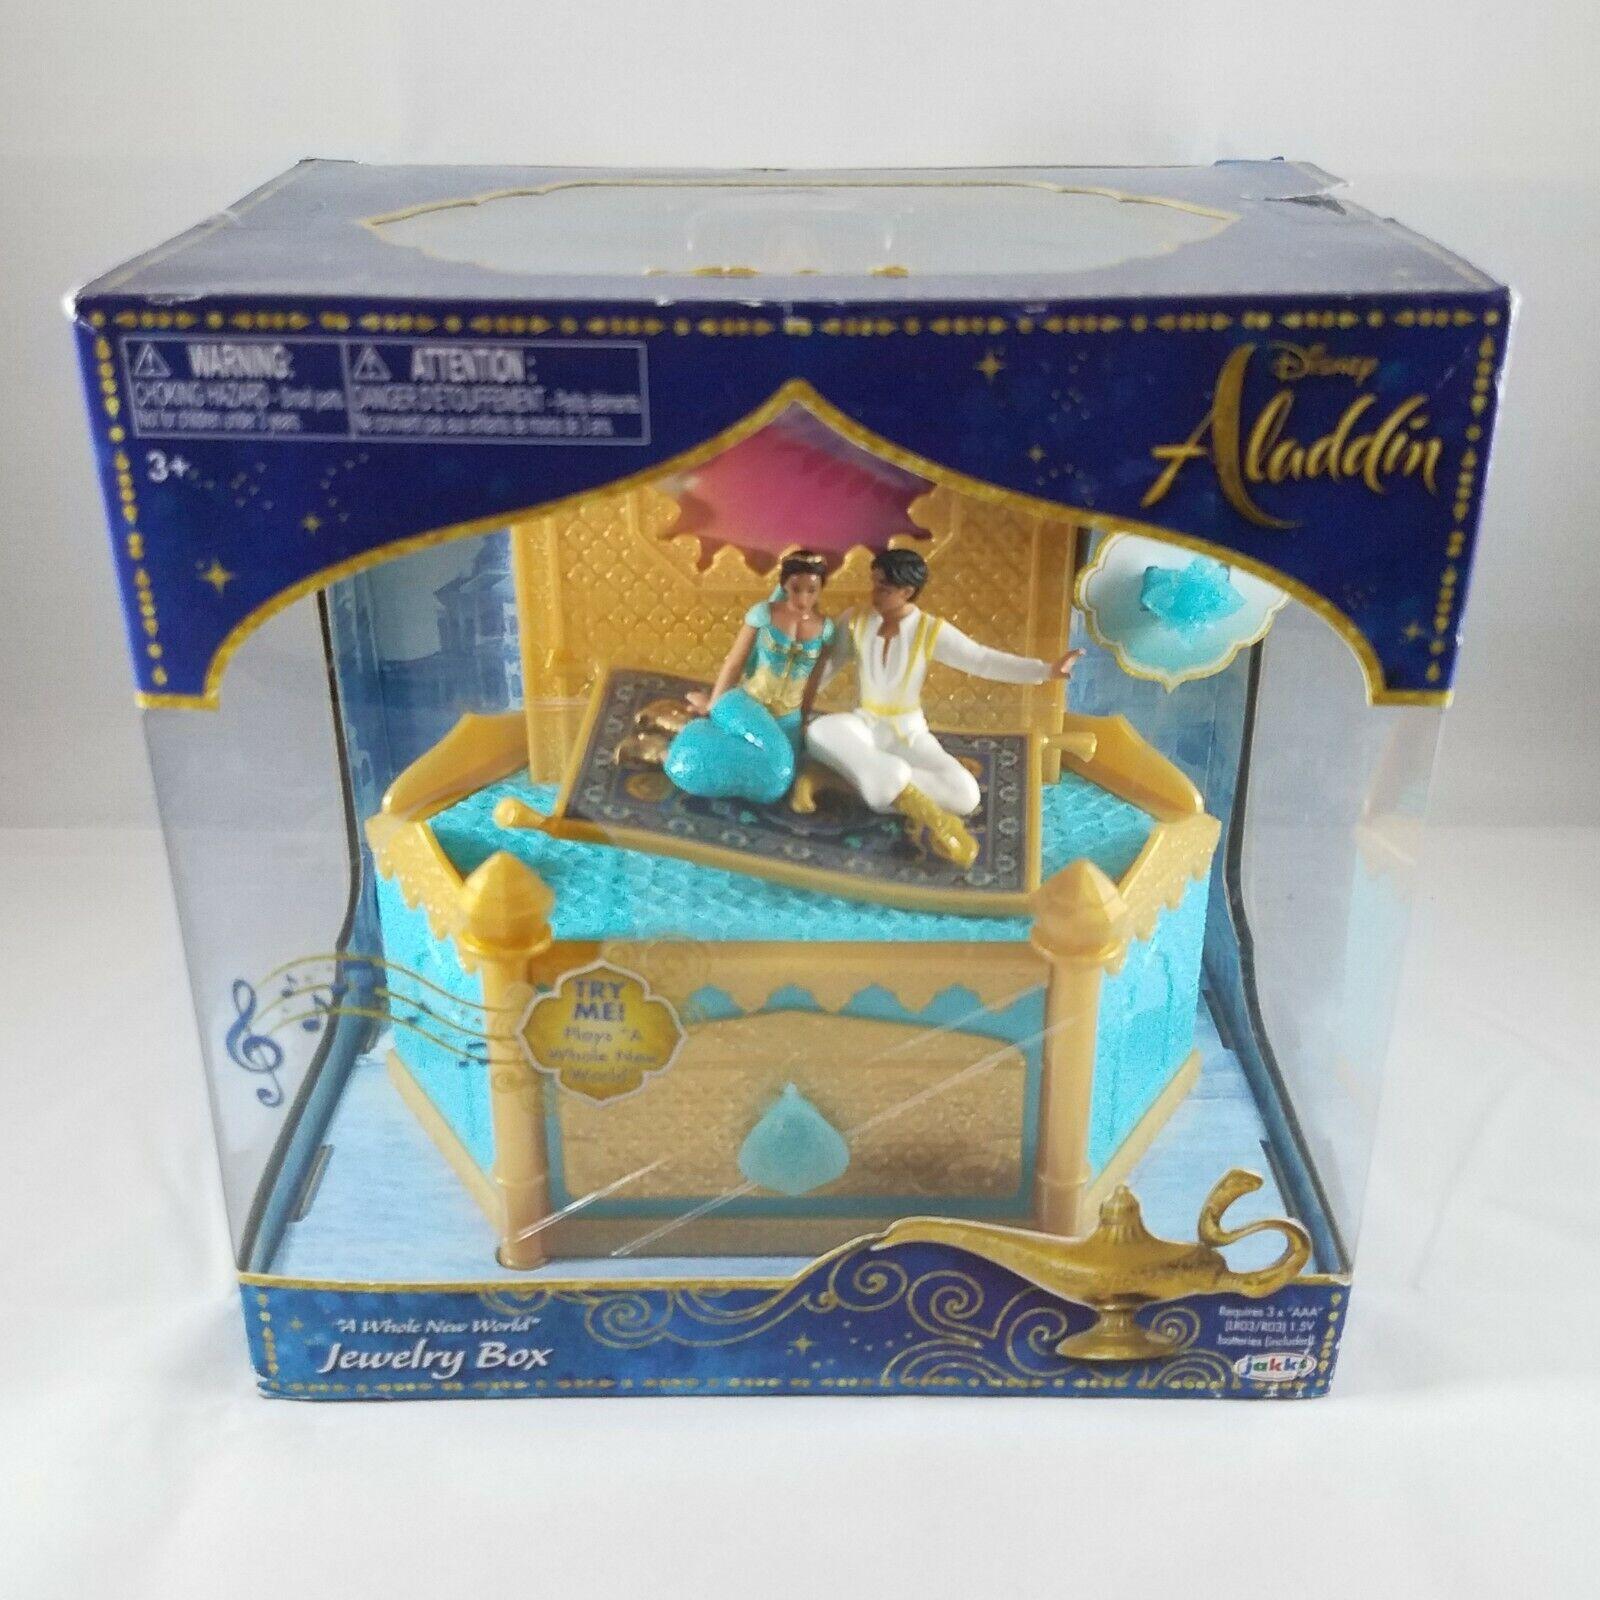 "Disney Aladdin /""A Whole New World/"" Musical Jewelry Box New in Box"